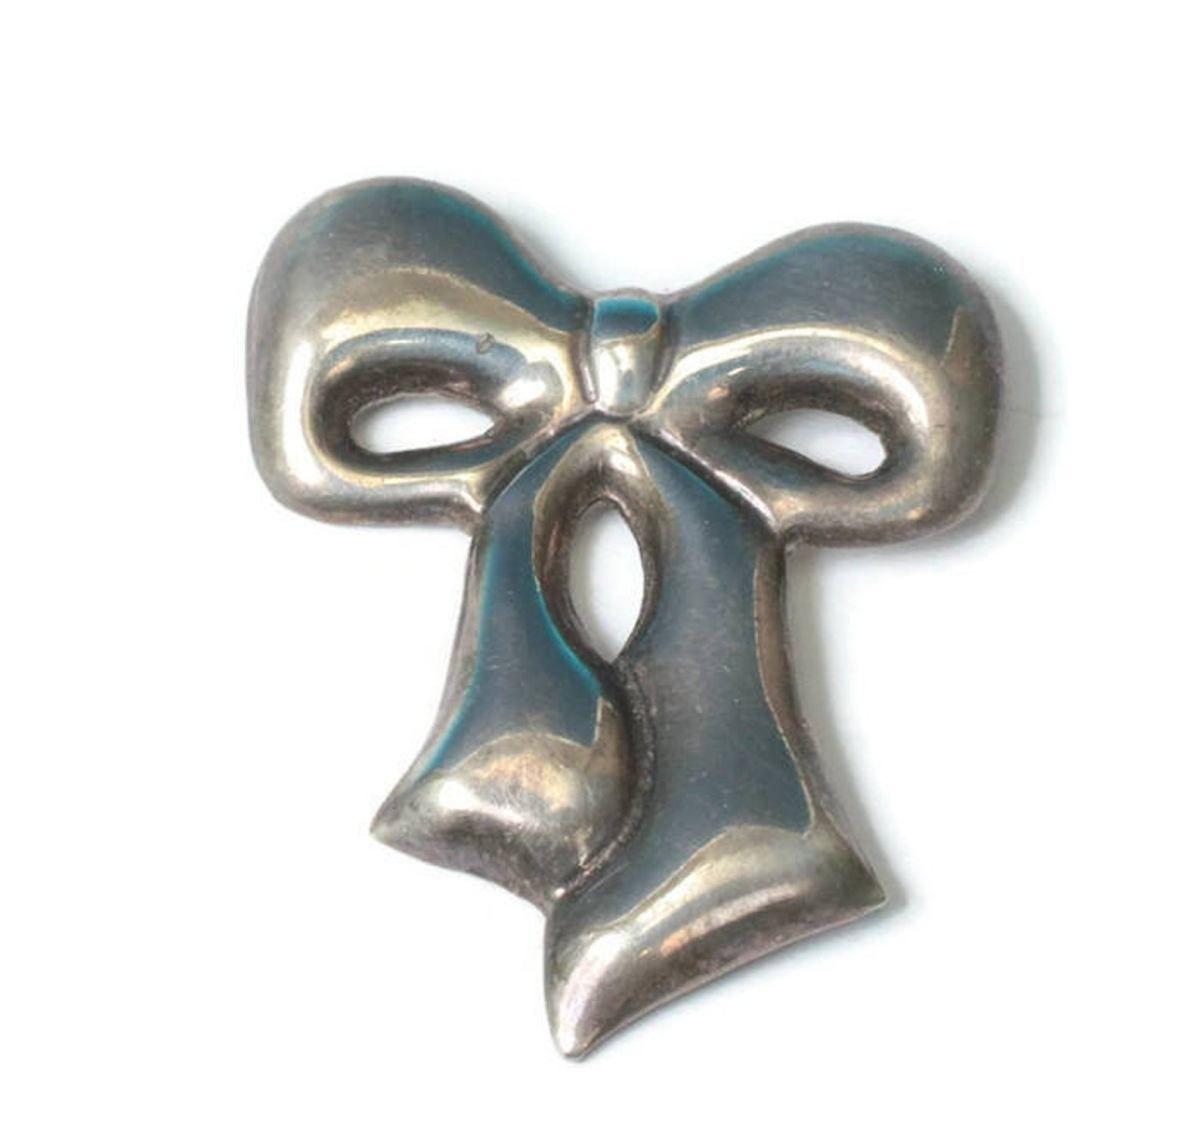 Vintage Silver Ribbon brooch Sterling Silver Bow Brooch Silver Bow Brooch Tube Clasp Vintage 925 Sertling Silver Bow Brooch